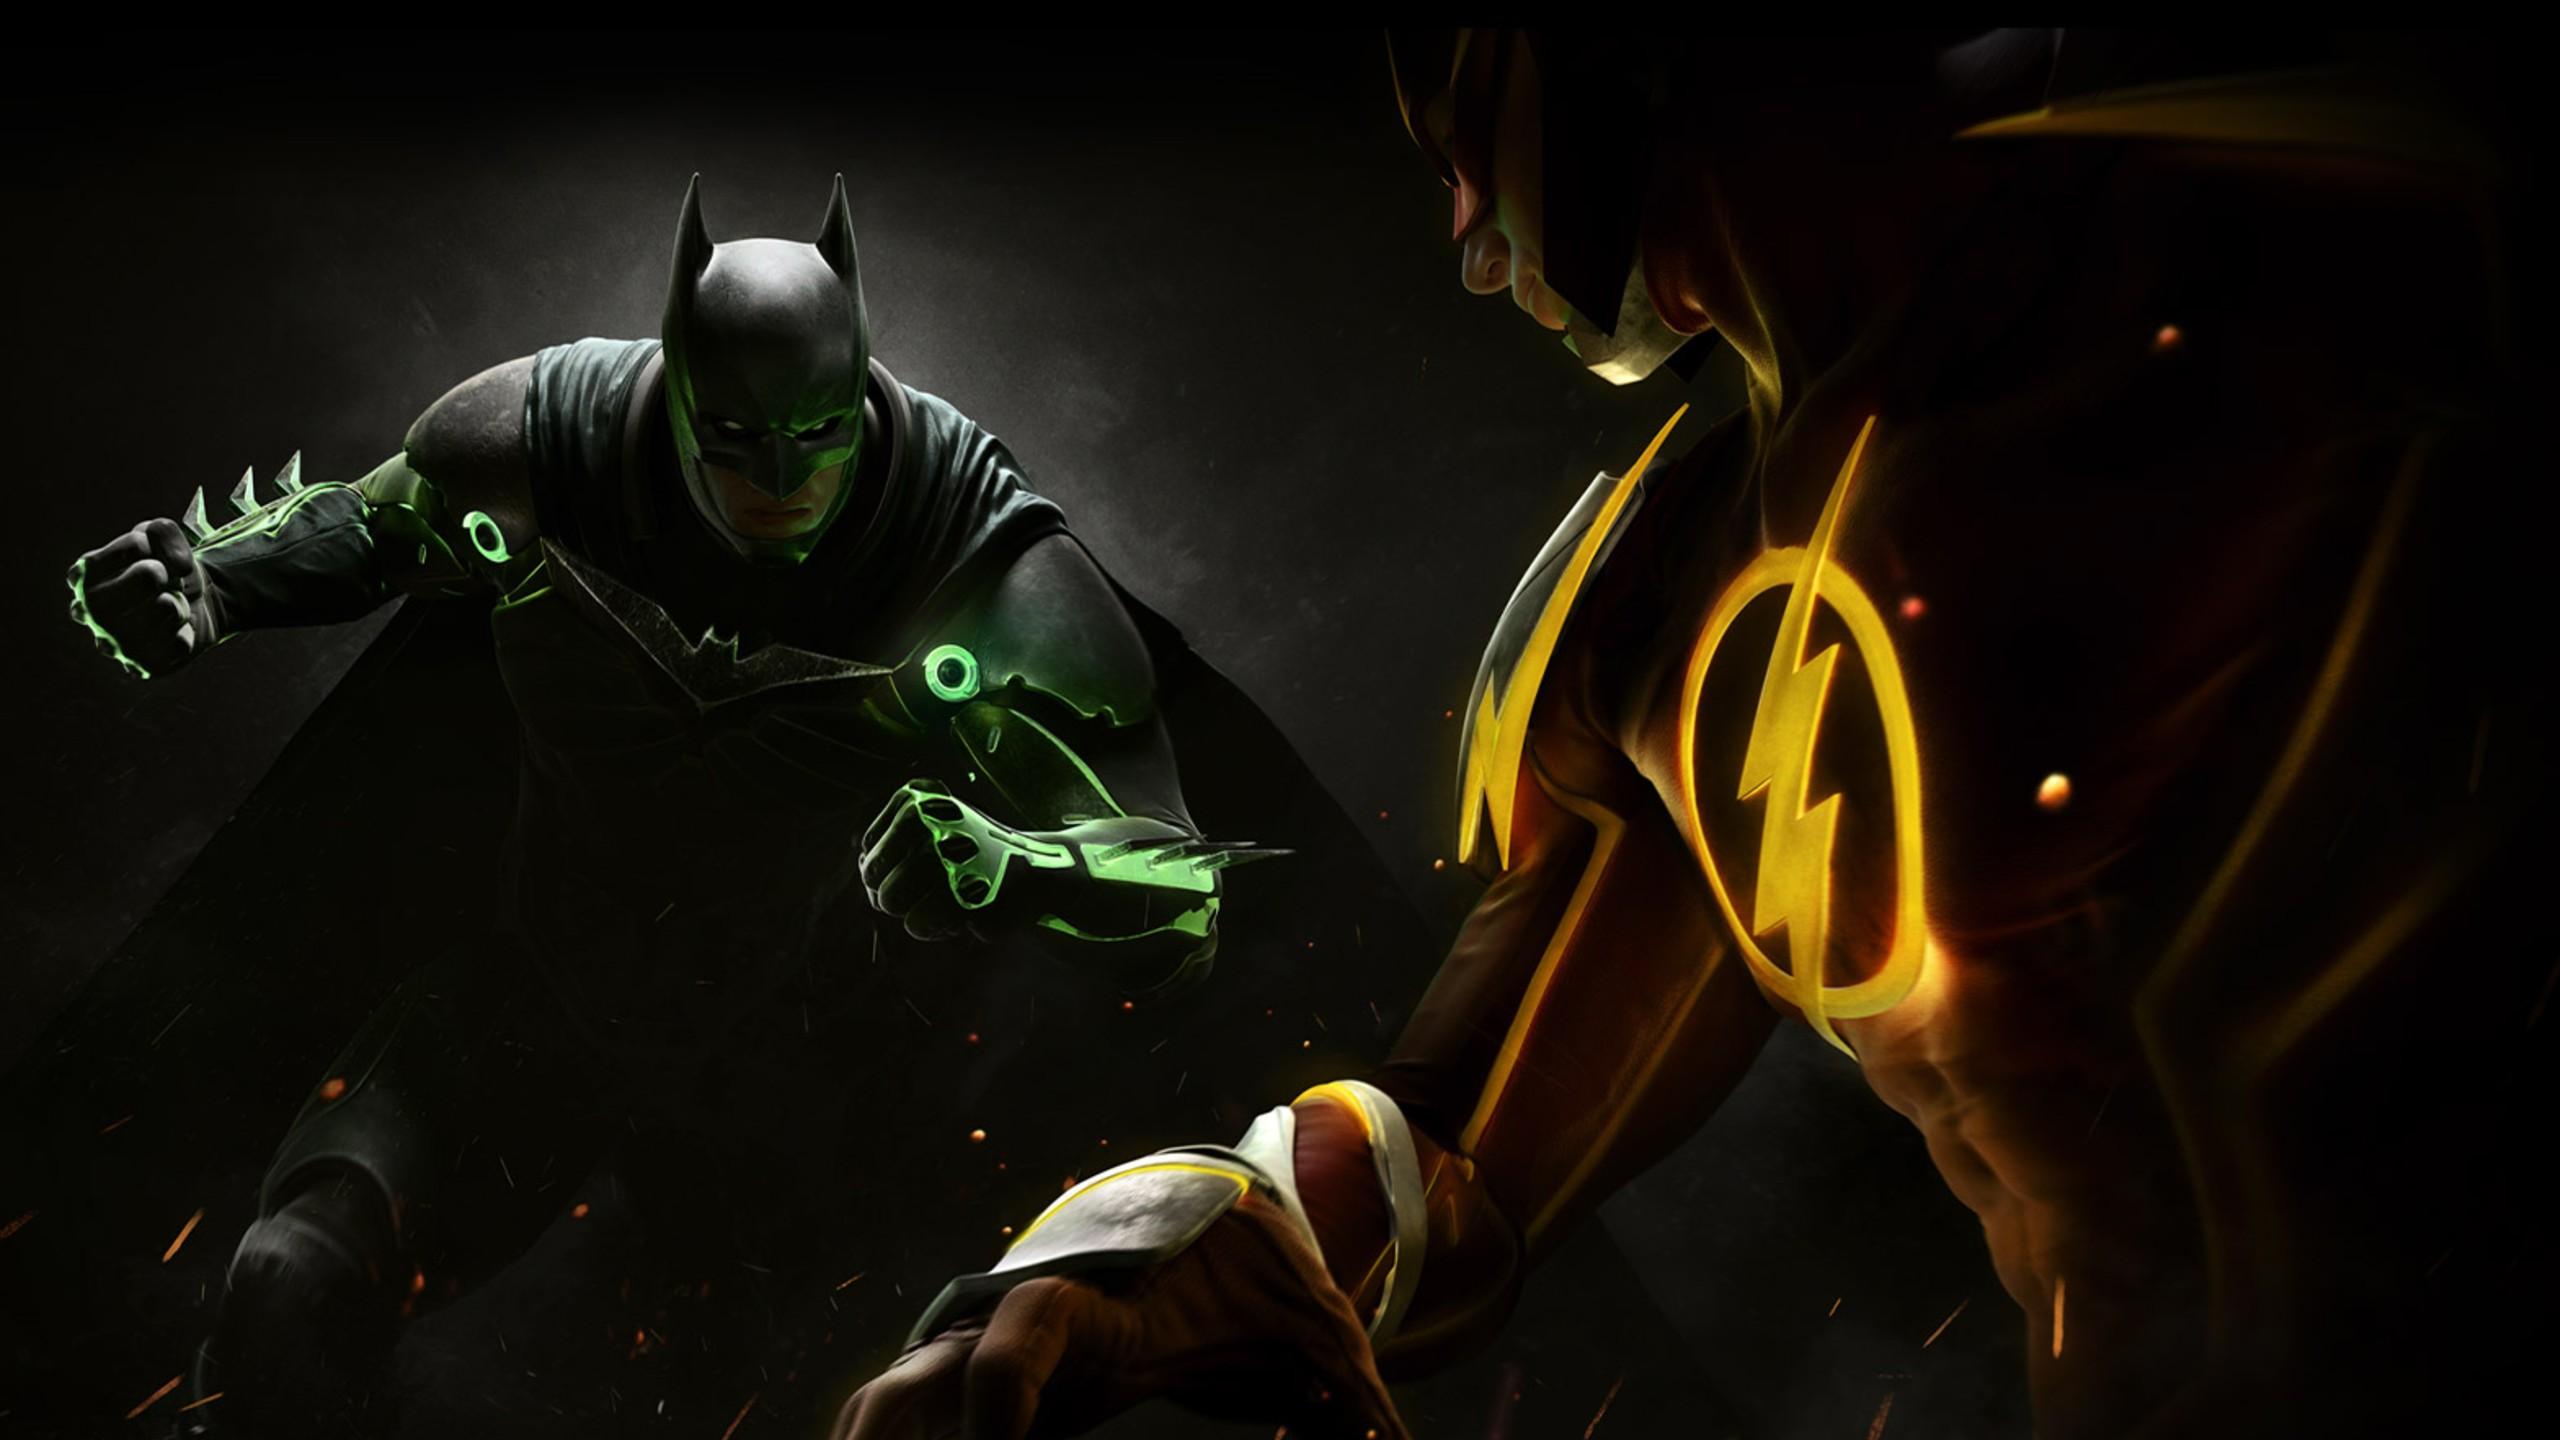 Injustice Video Game